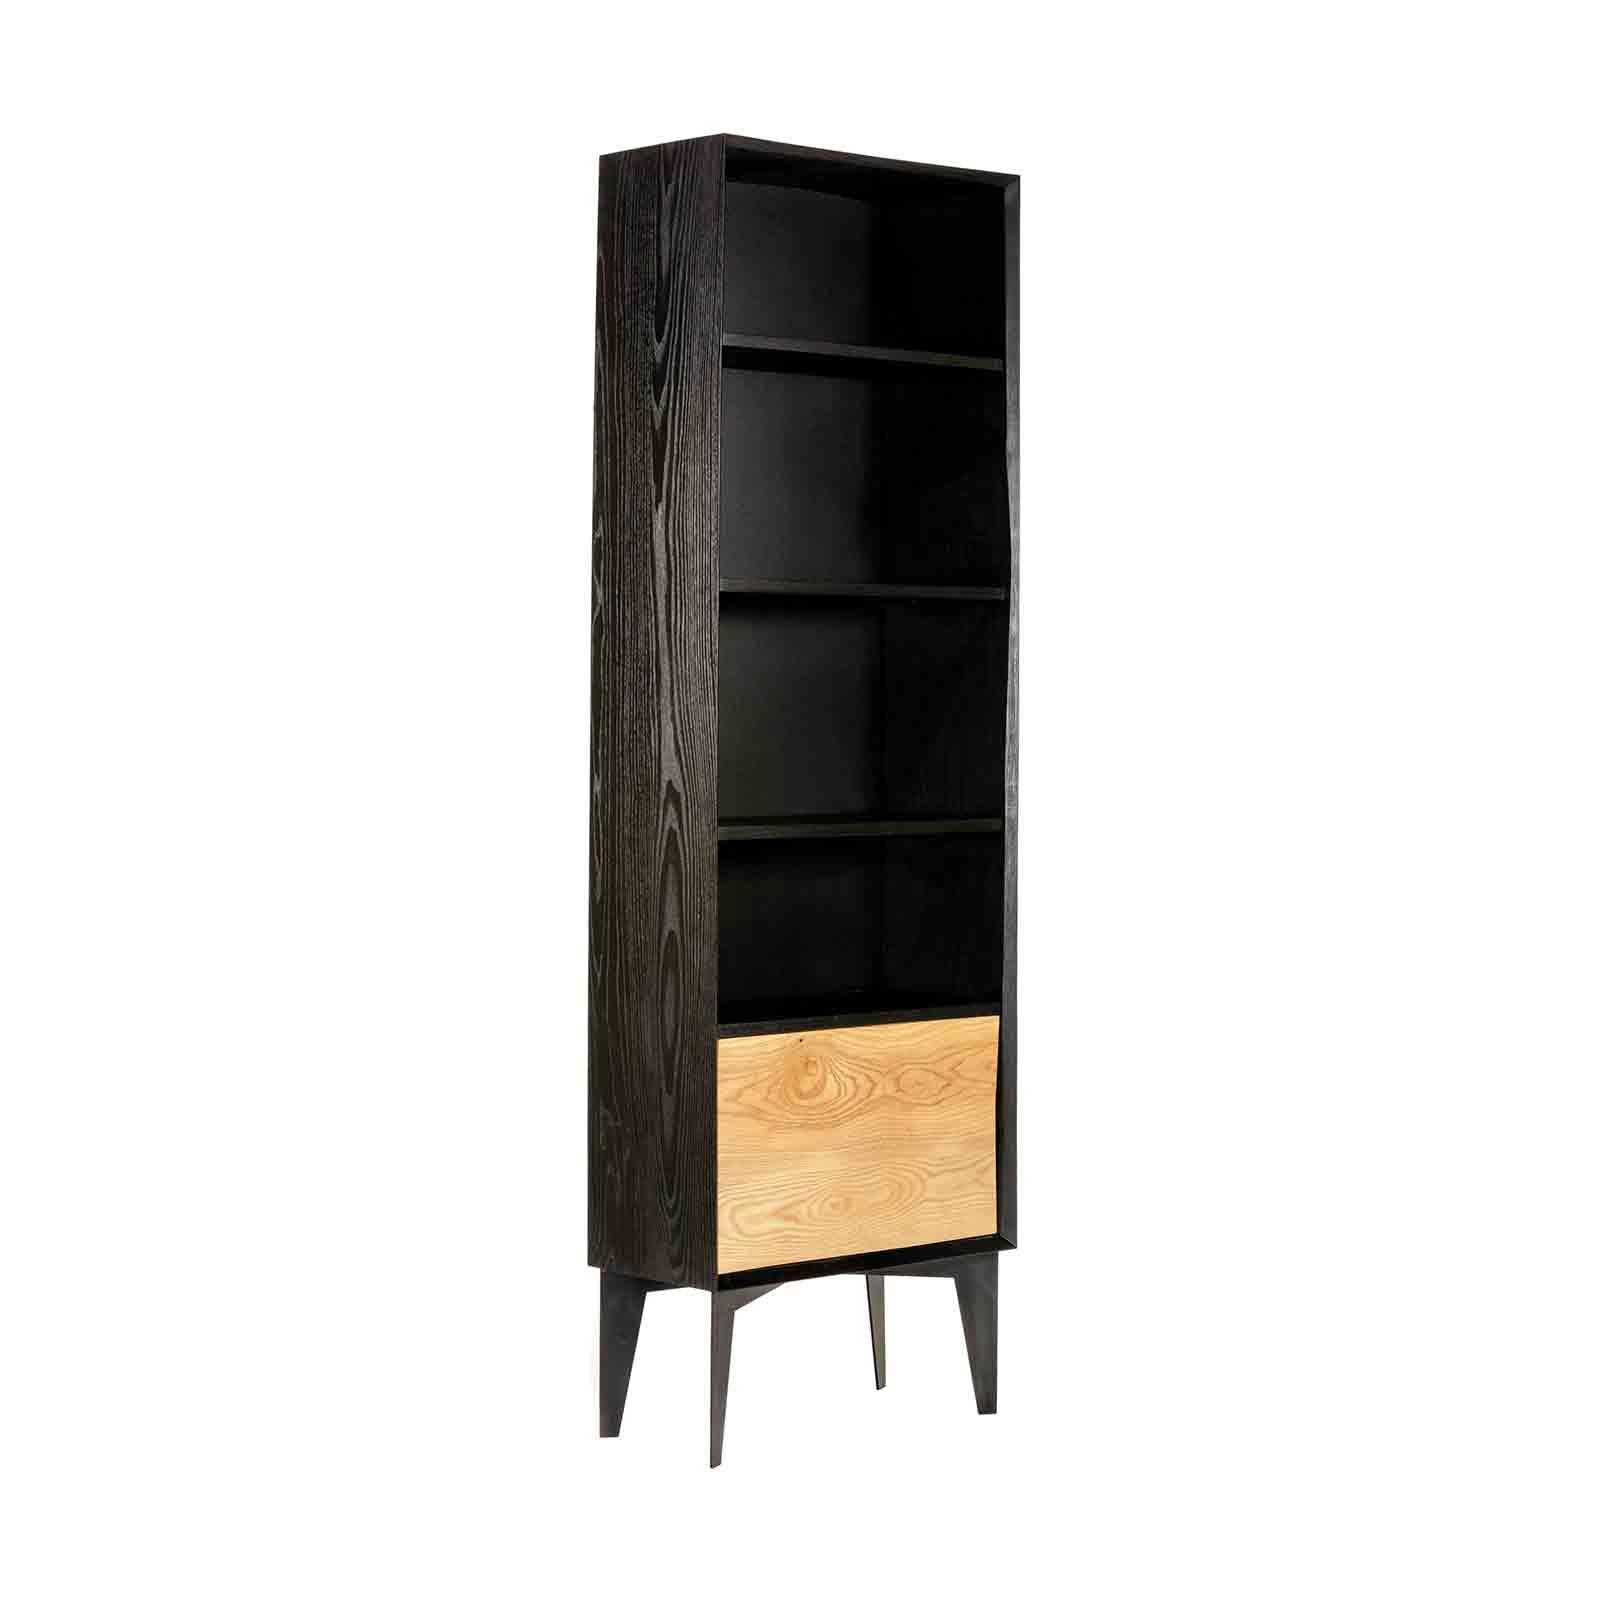 Westchester Bookshelf